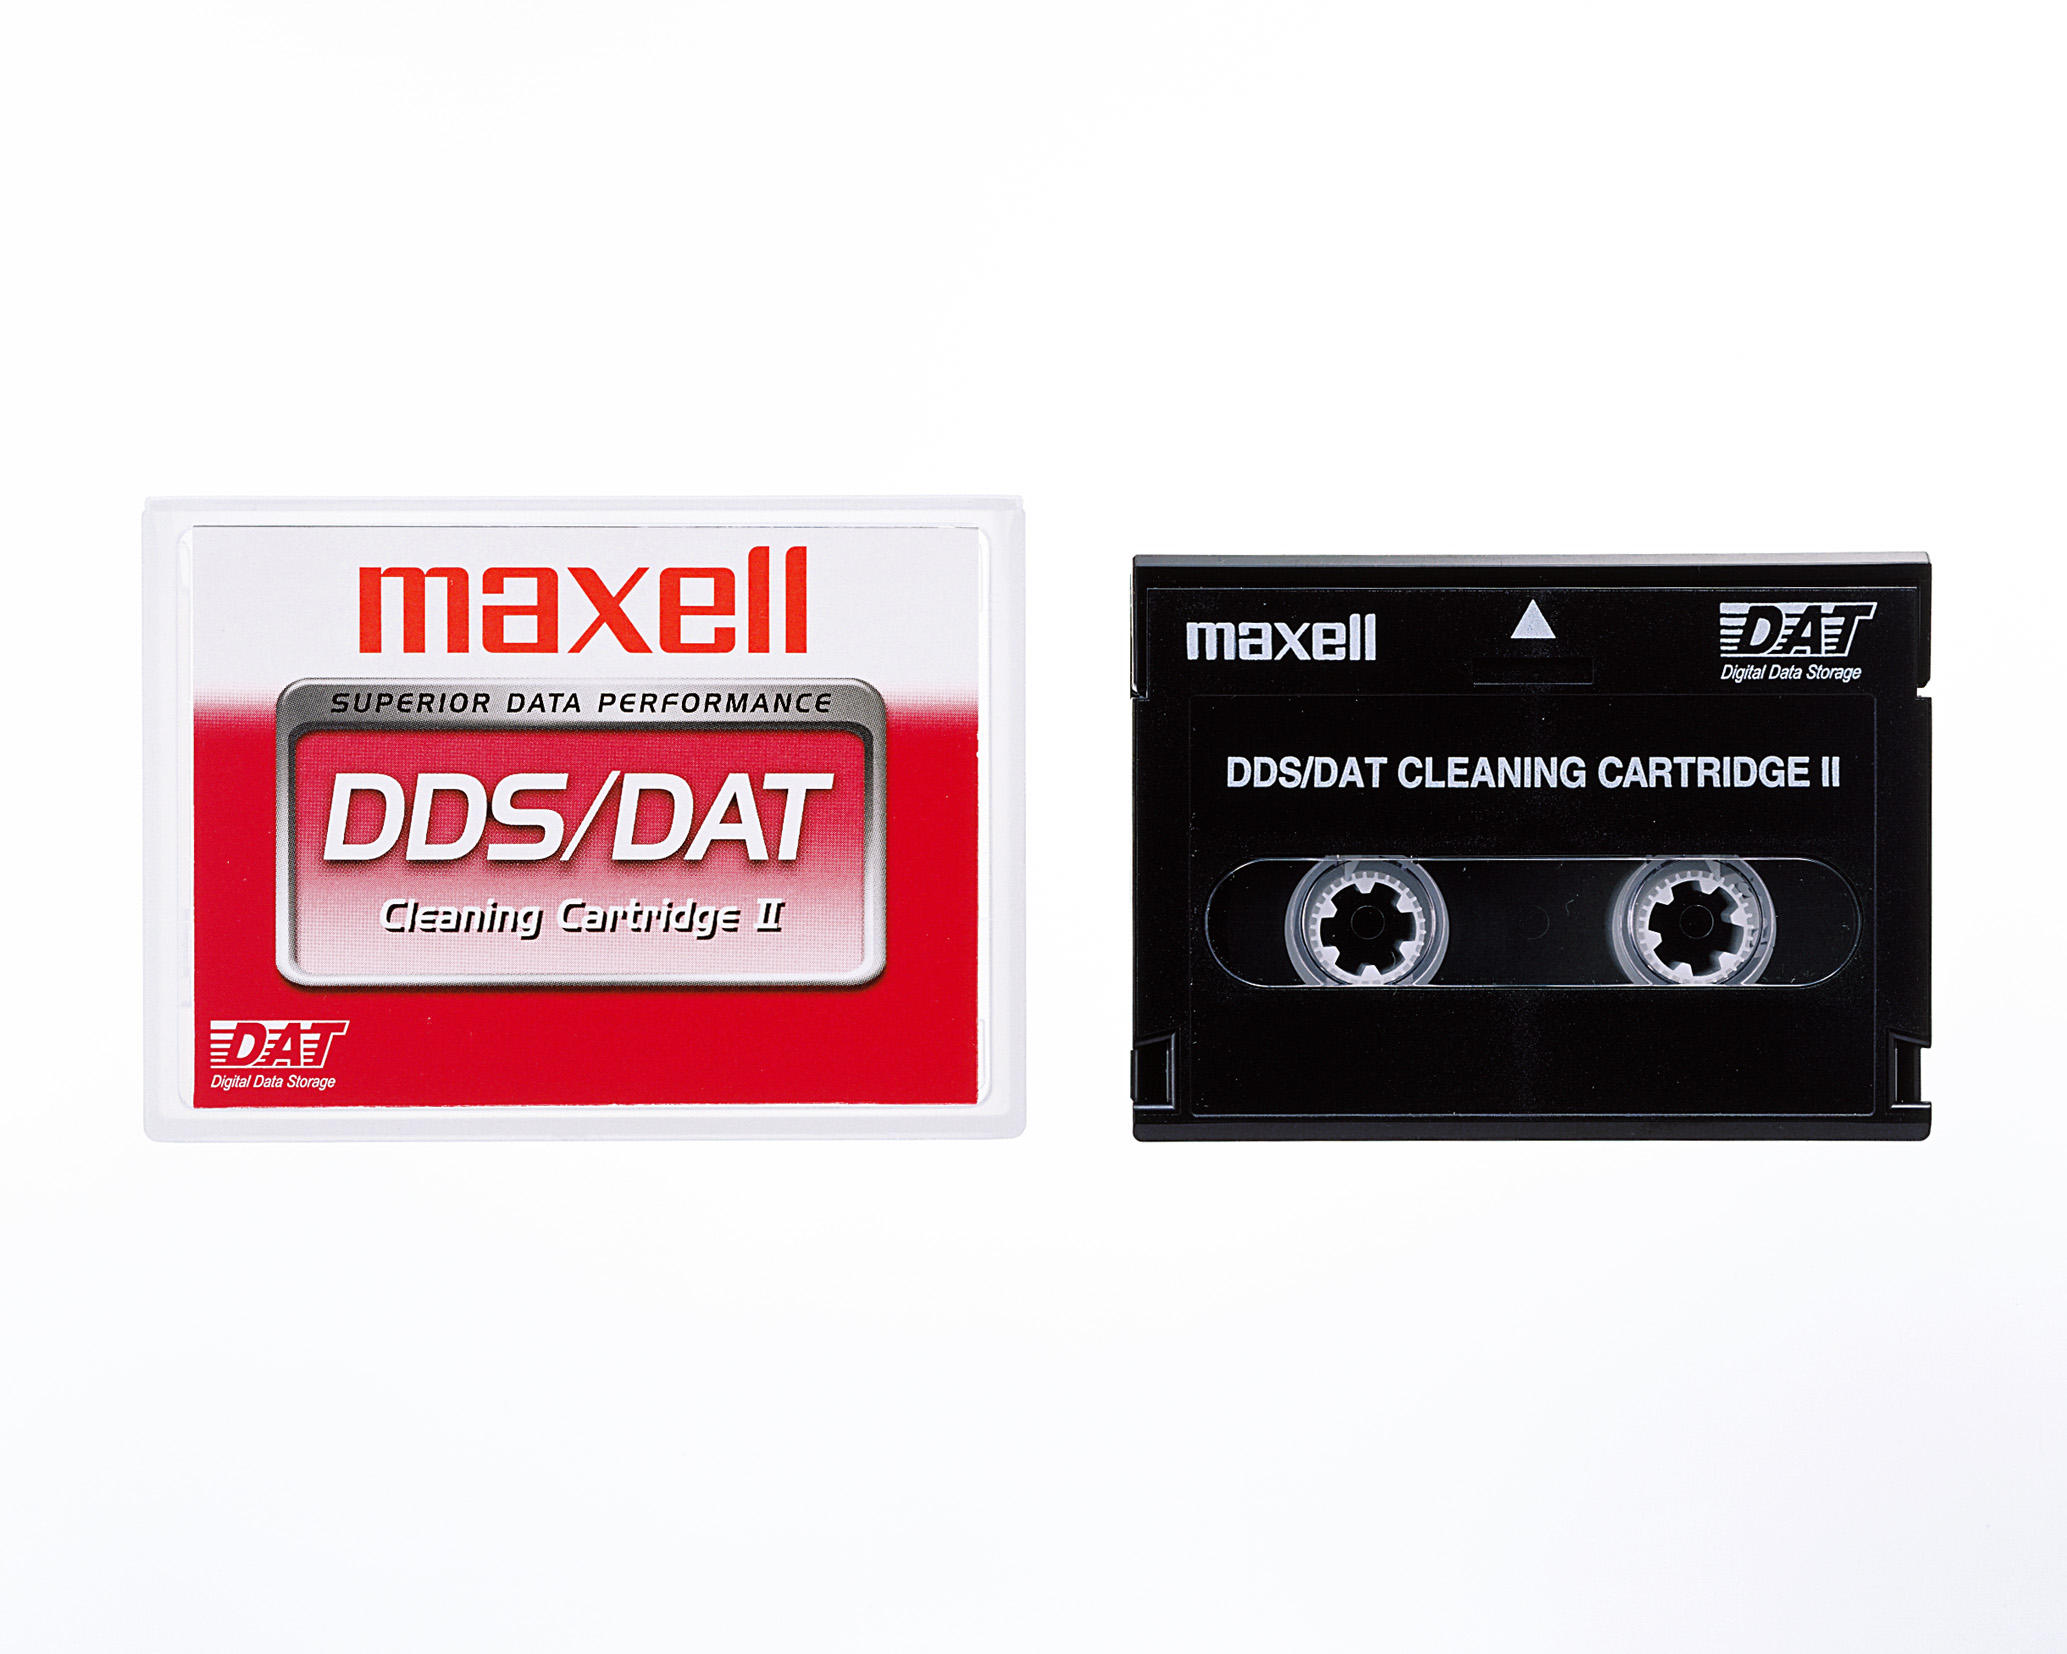 dat dds データカートリッジ 在庫なくなり次第販売終了 データ